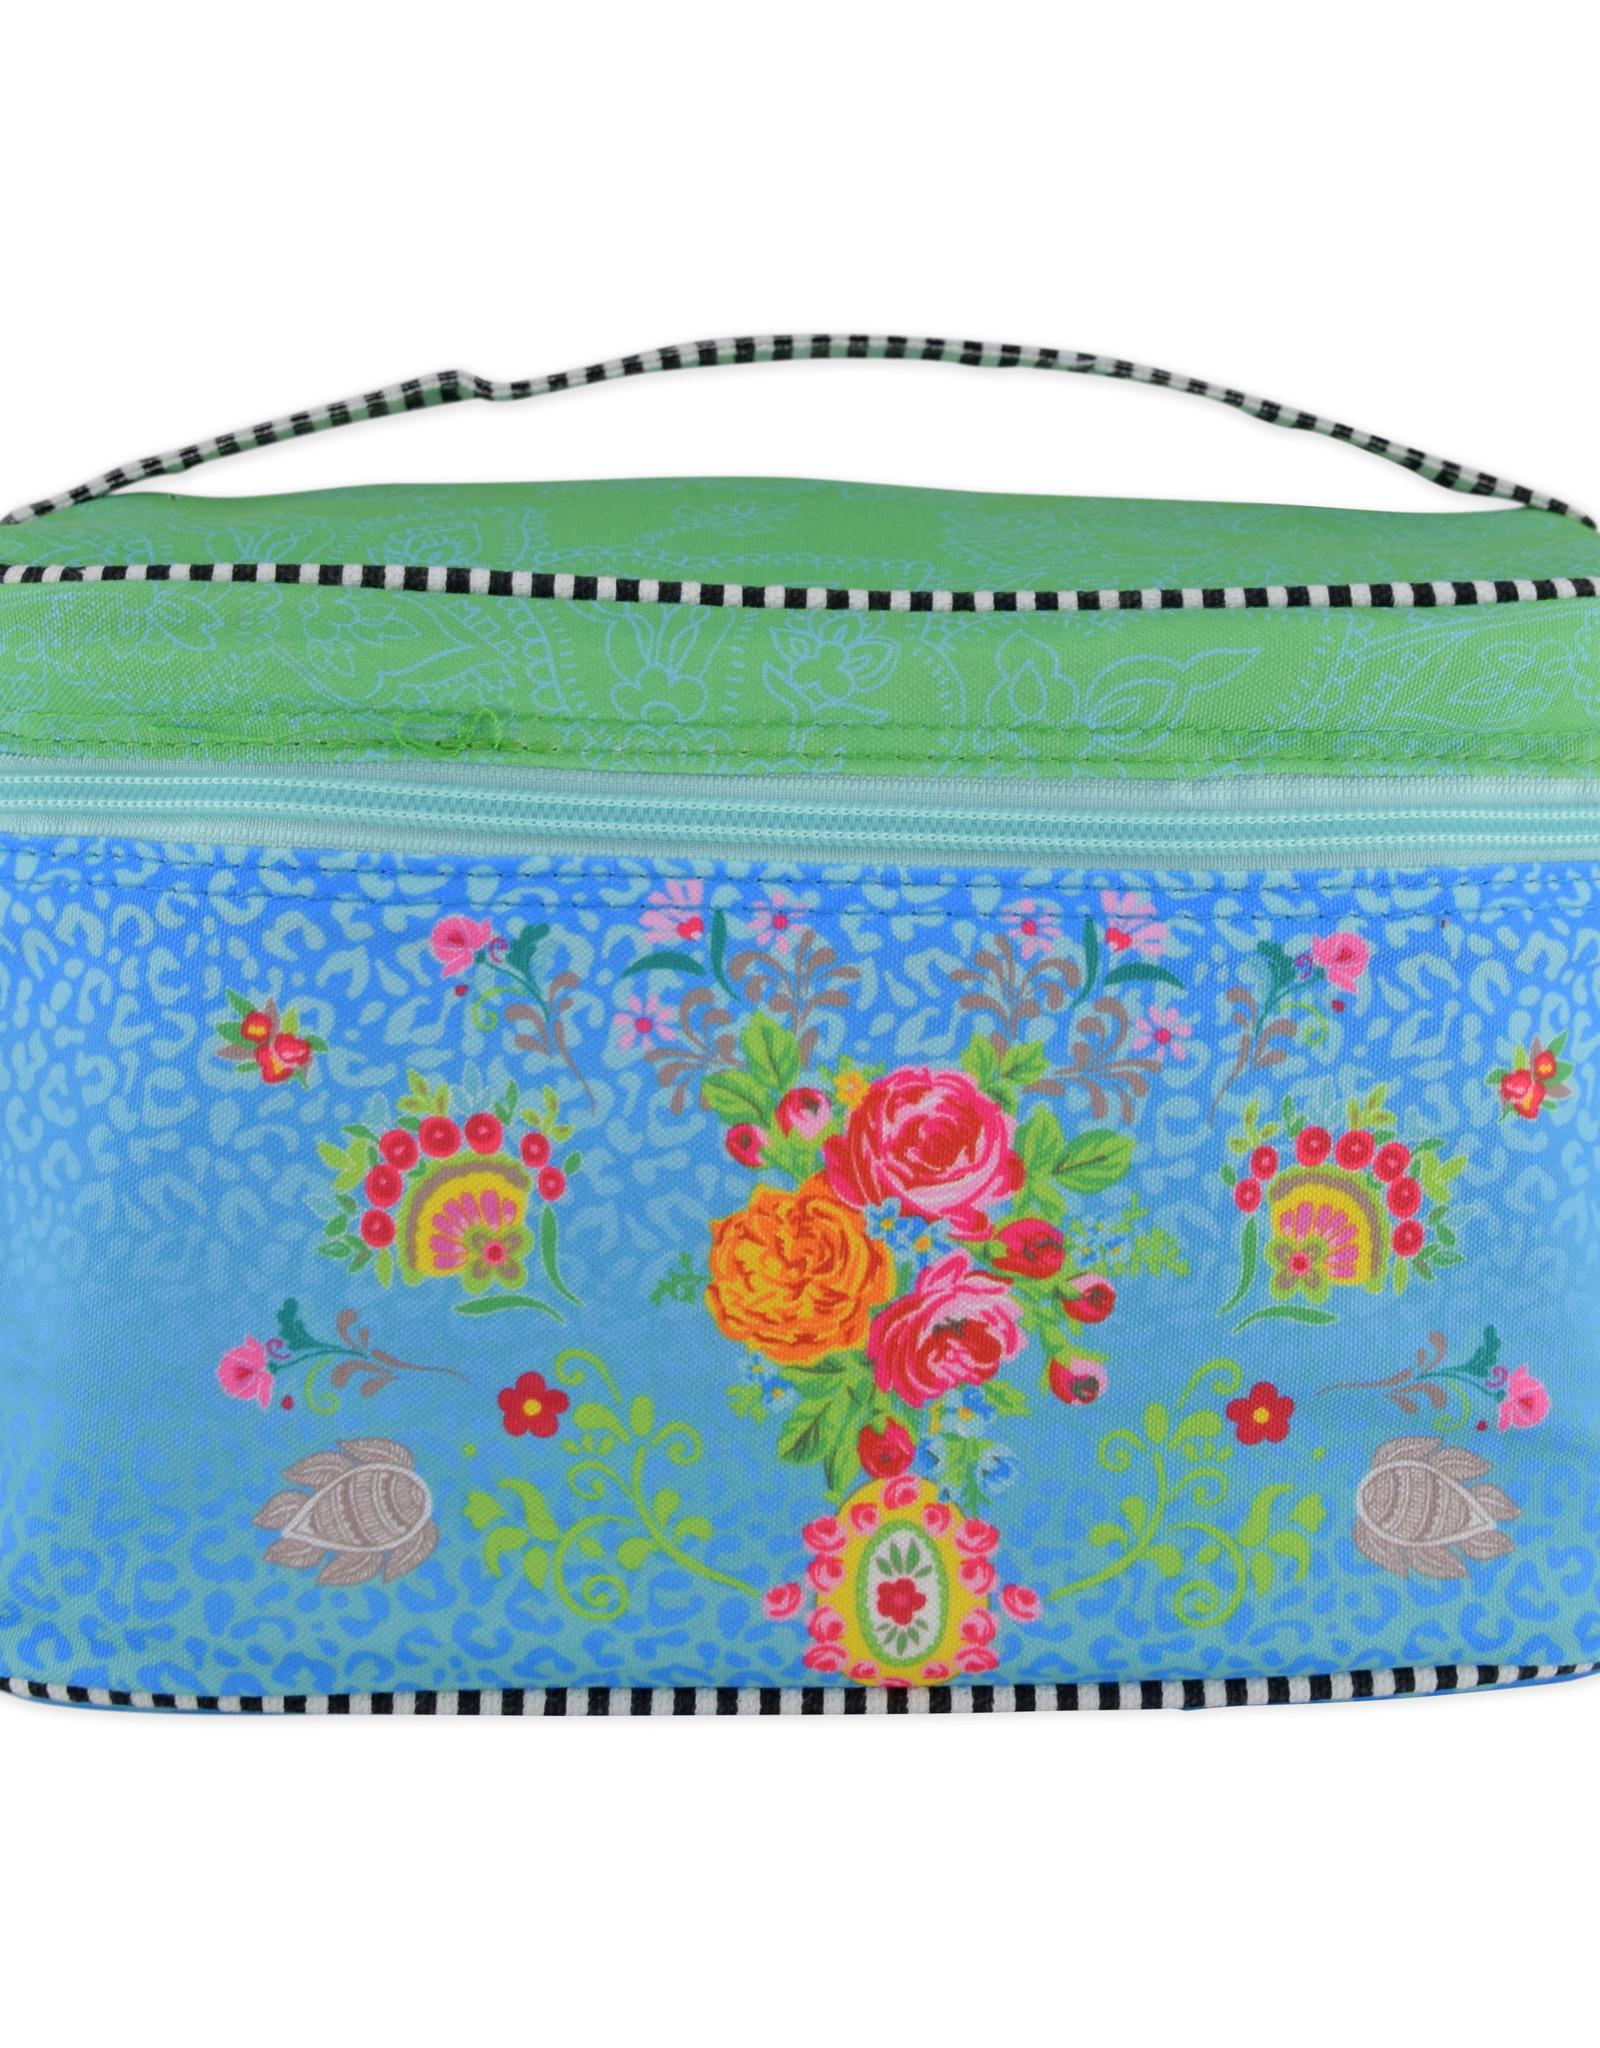 Happiness Woodstock - Beauty Bag